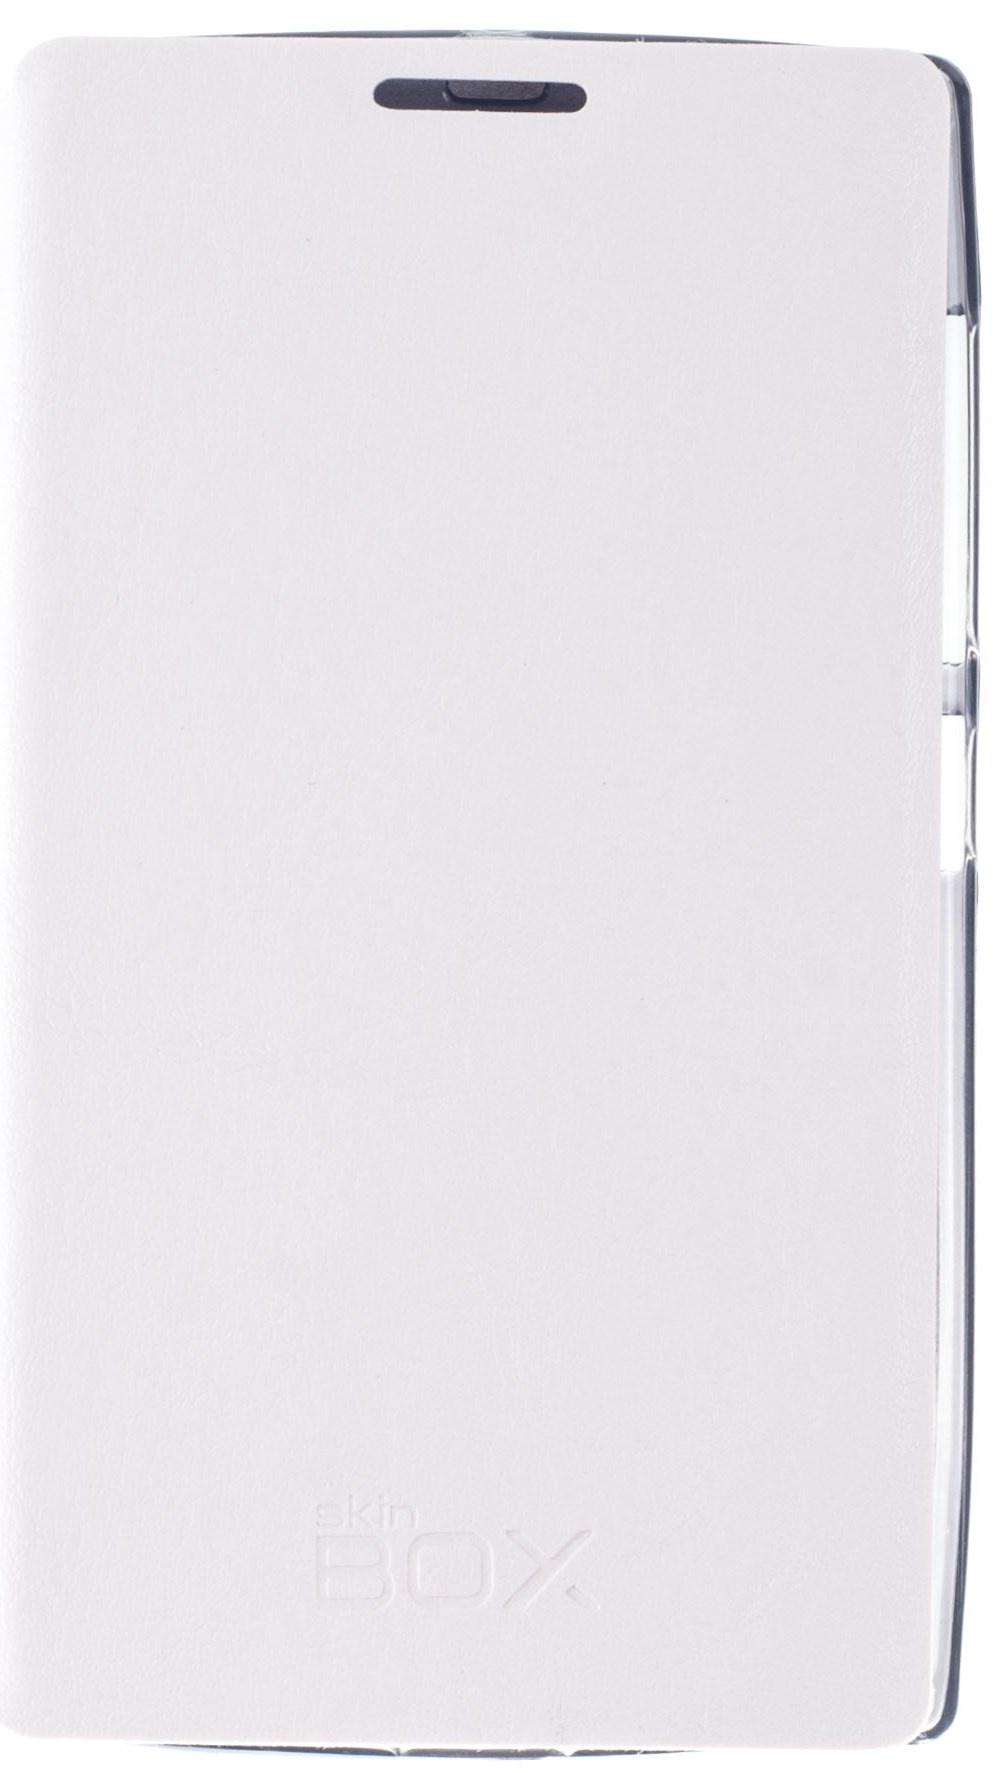 Чехол для сотового телефона skinBOX Lux, 4630042526761, белый nokia cc 3096 чехол для lumia 435 532 bright green